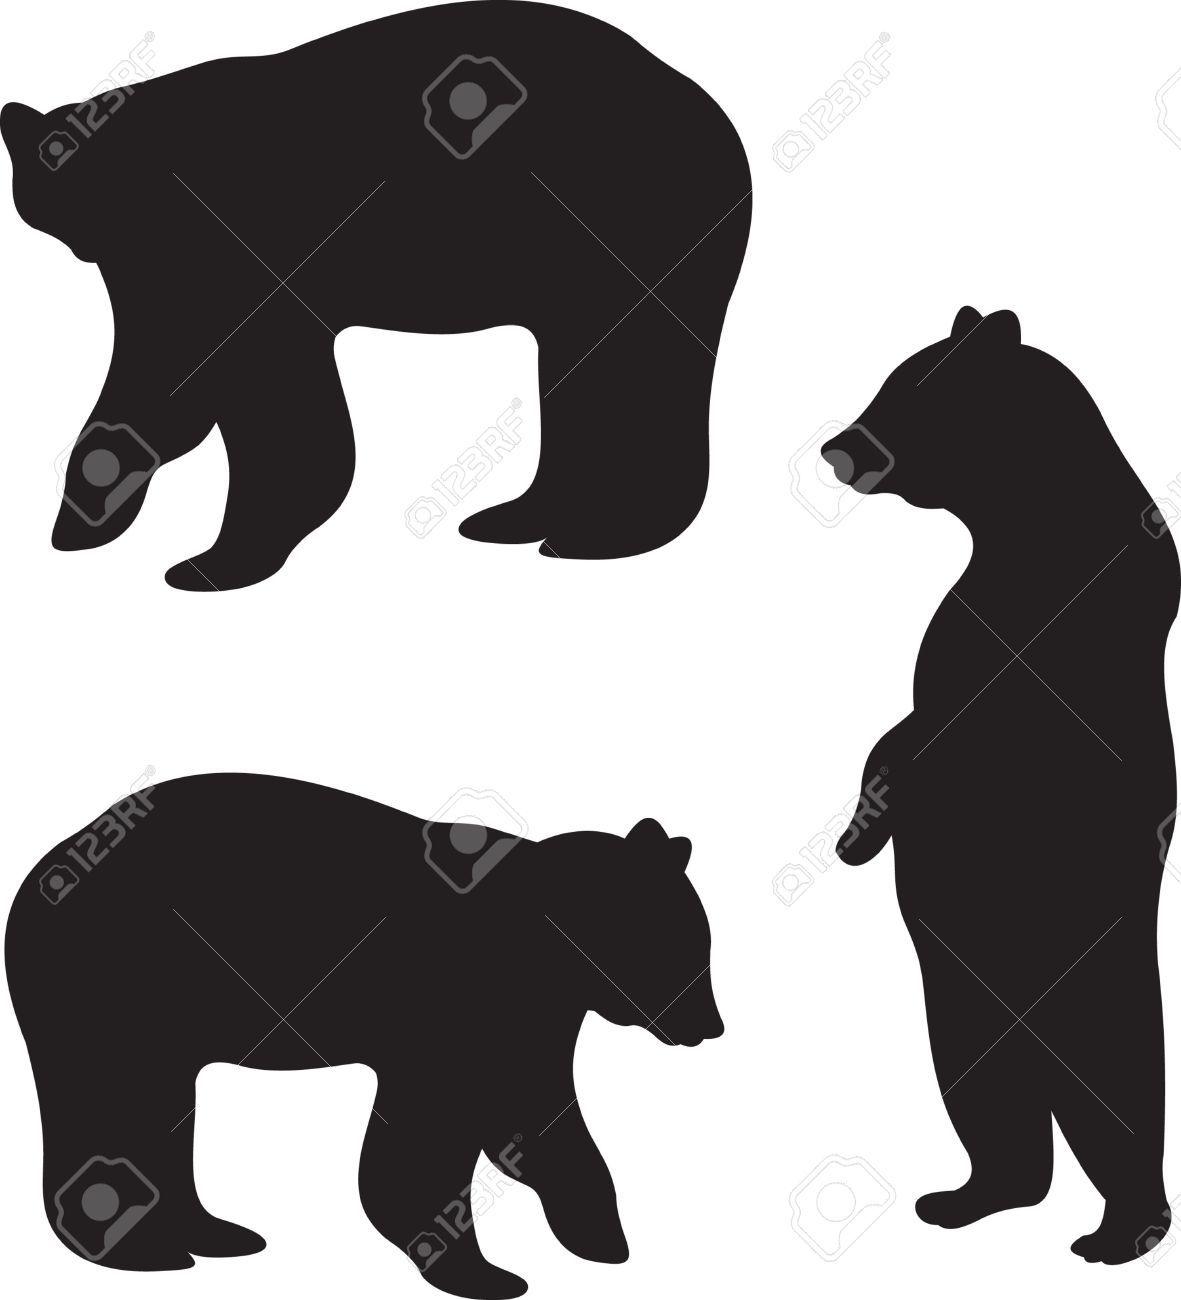 1181x1300 Teddy Bear Silhouette Clip Art